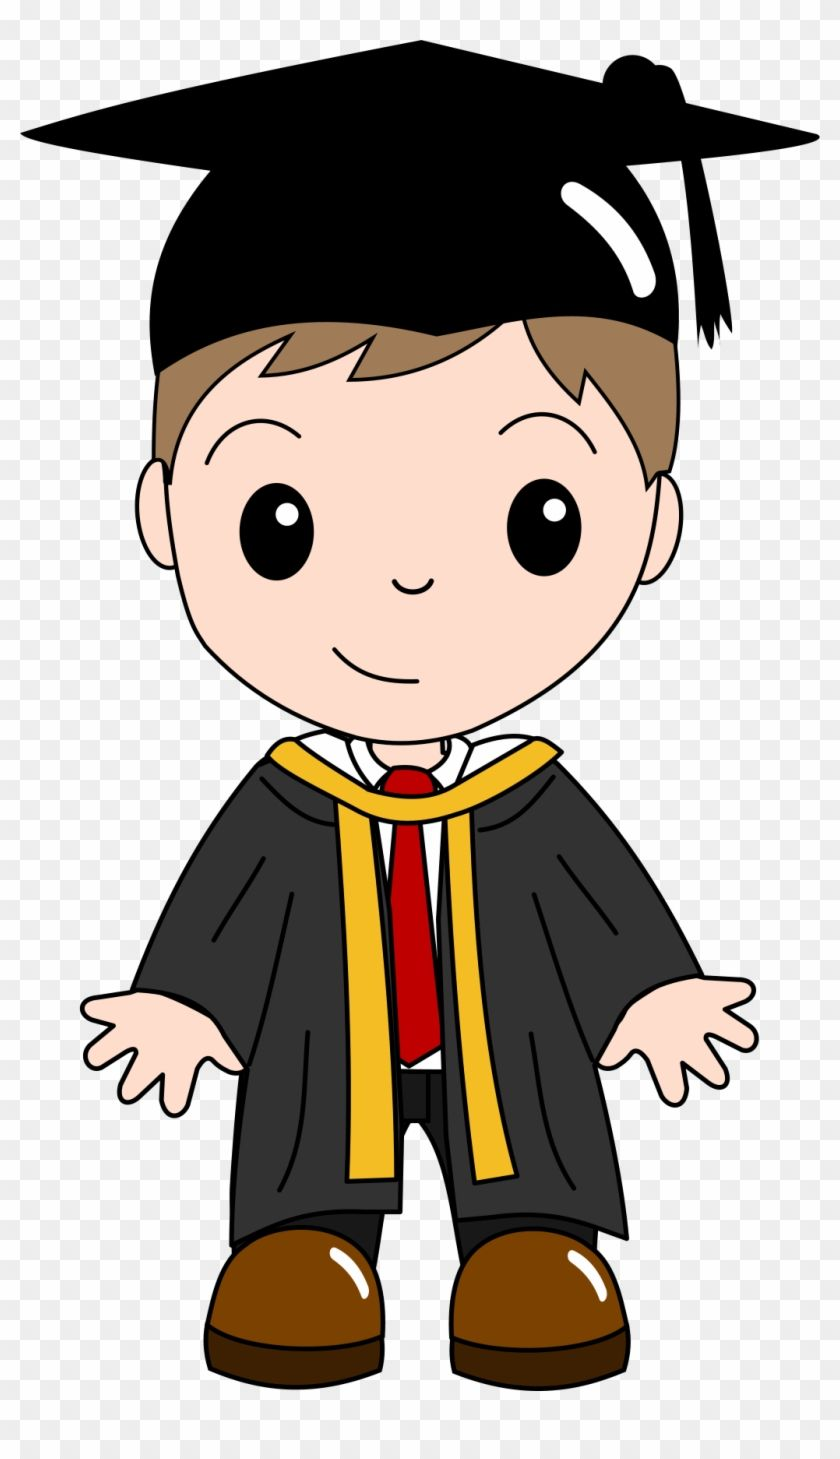 Download And Share Clipart About Graduation Ceremony Child Cartoon Clip Art Graduation Boy Clipart Png Find More Cartoon Clip Art Graduation Cartoon Cartoon